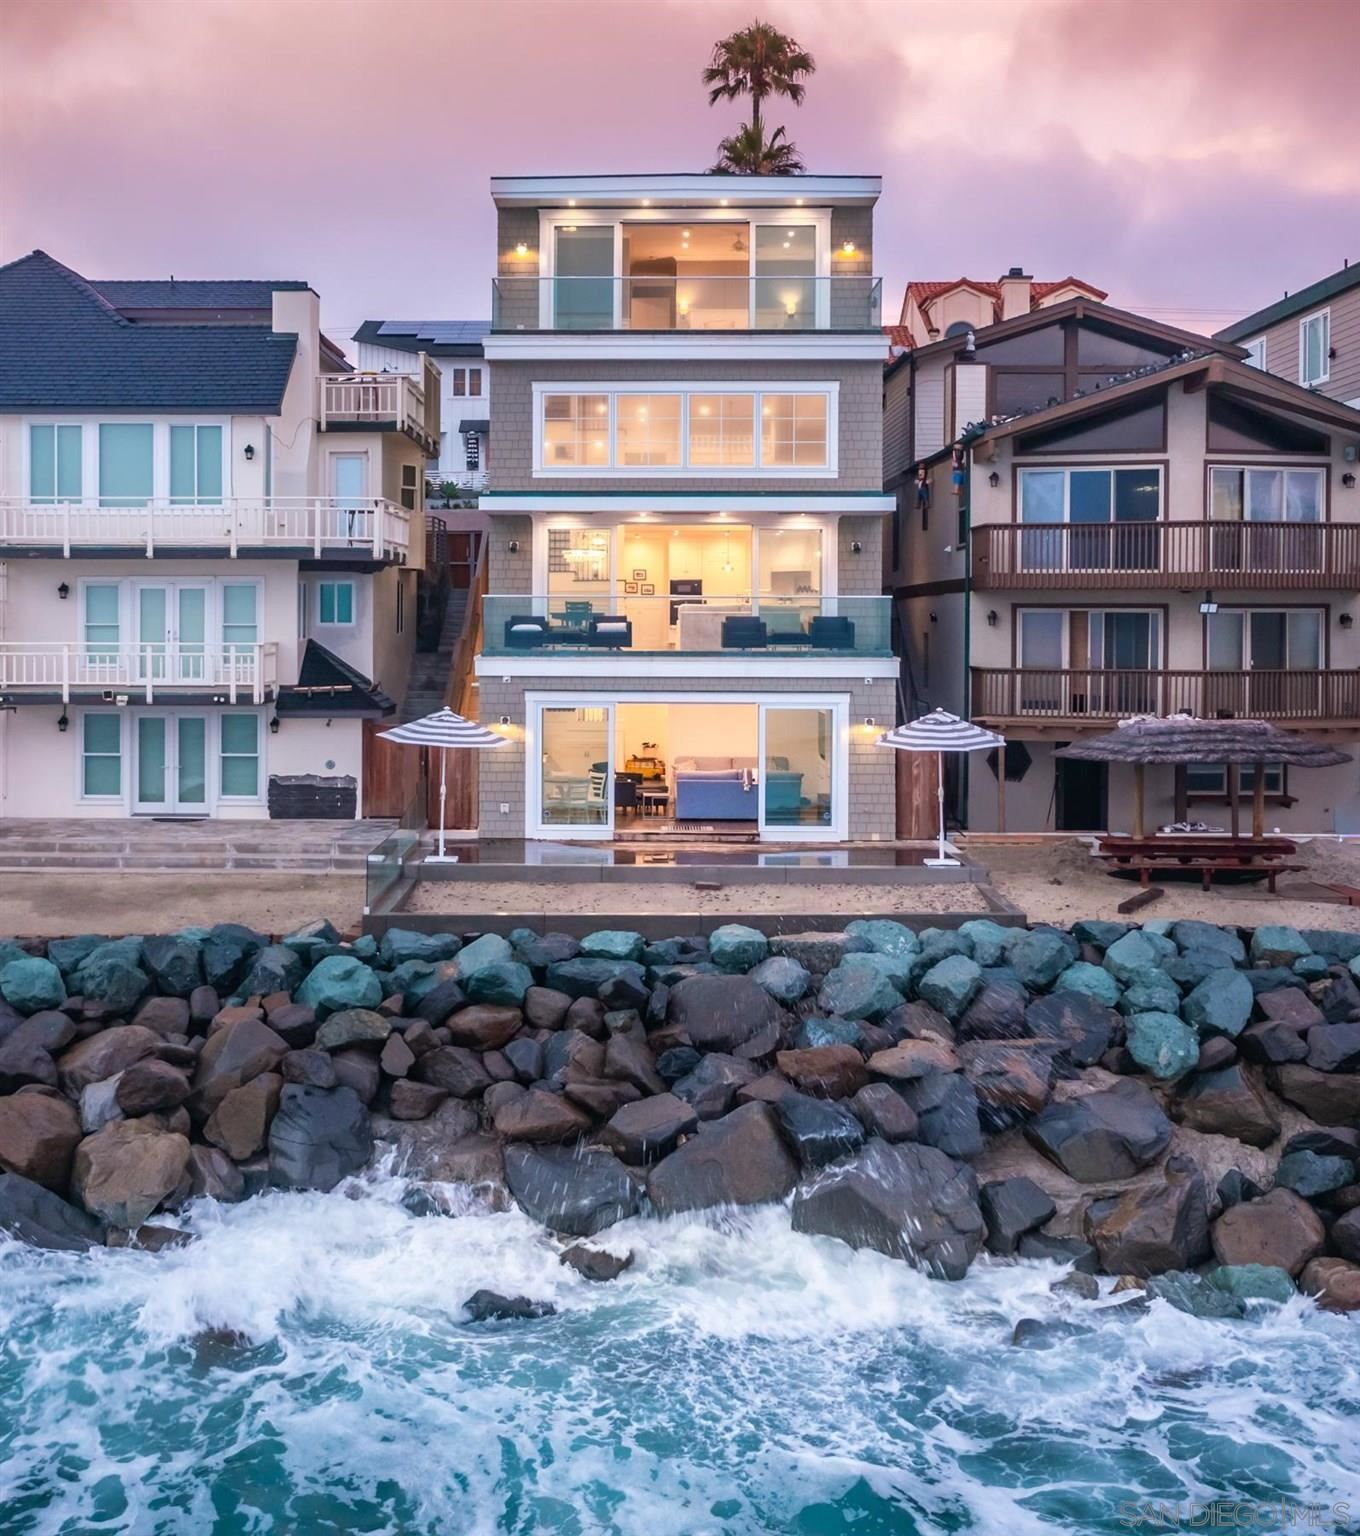 Photo of 1819 S Pacific St, Oceanside, CA 92054 (MLS # 210021834)